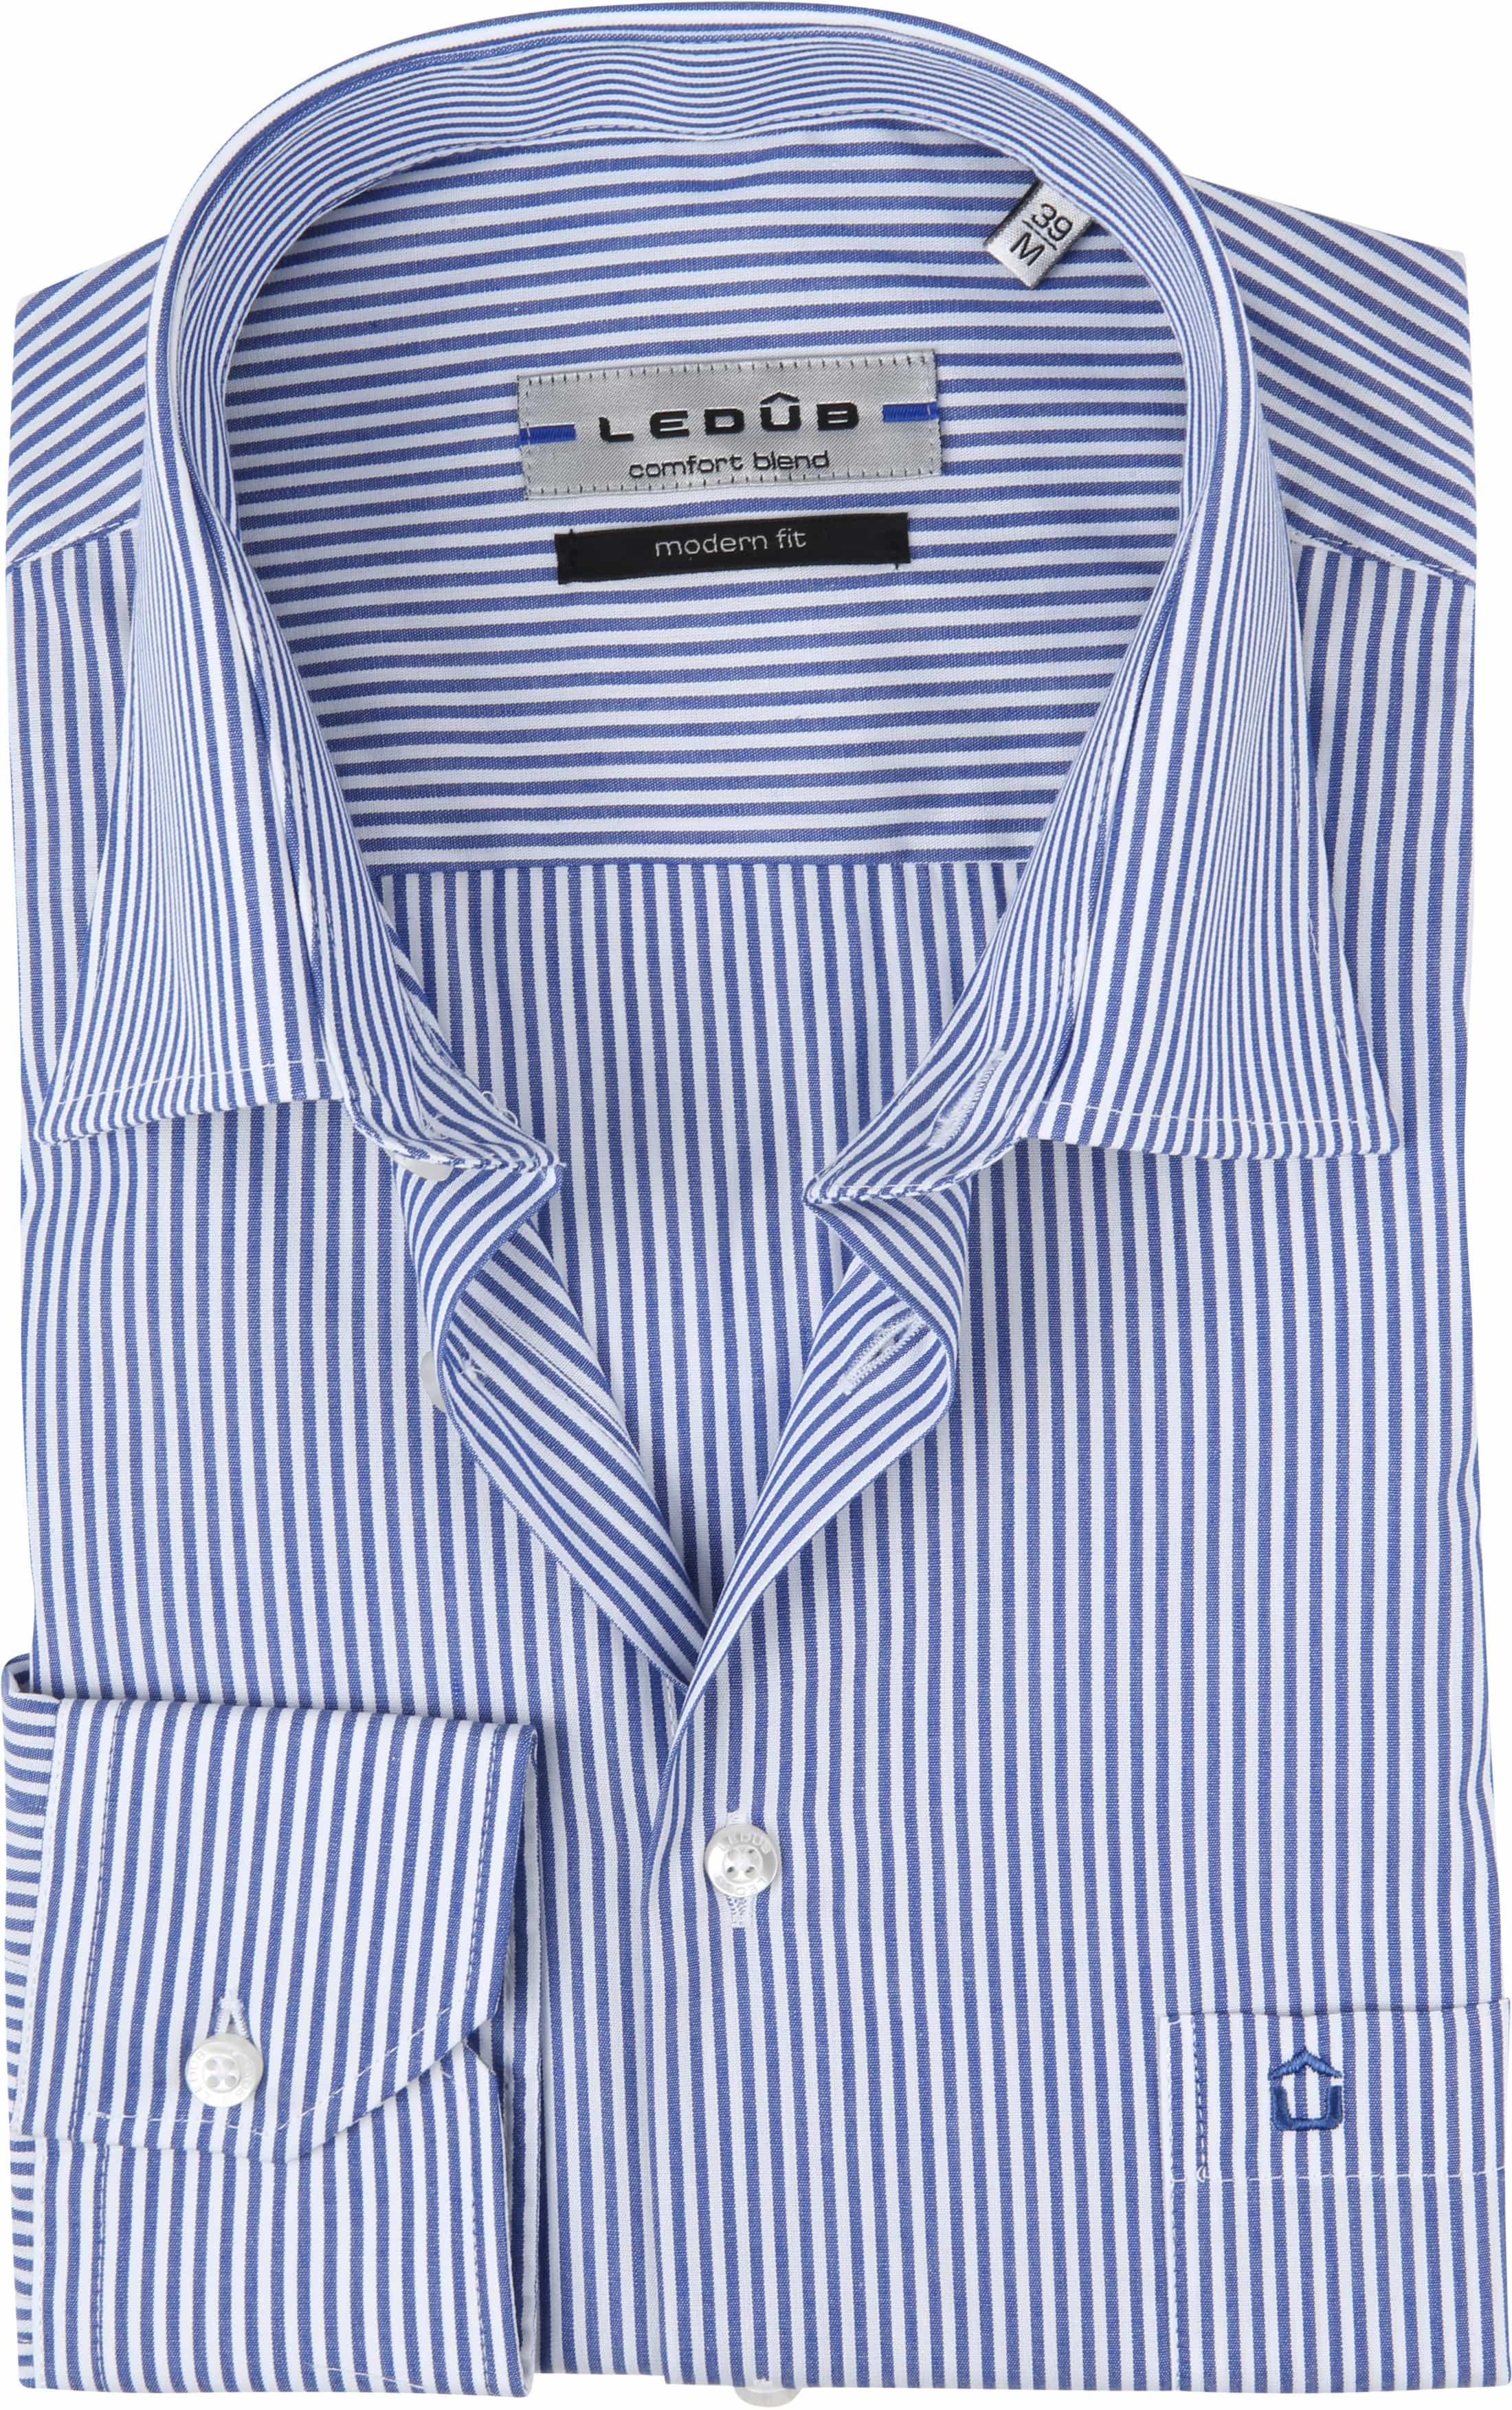 522e893f624a Ledub Shirt MF Striped Blue 0024525 order online